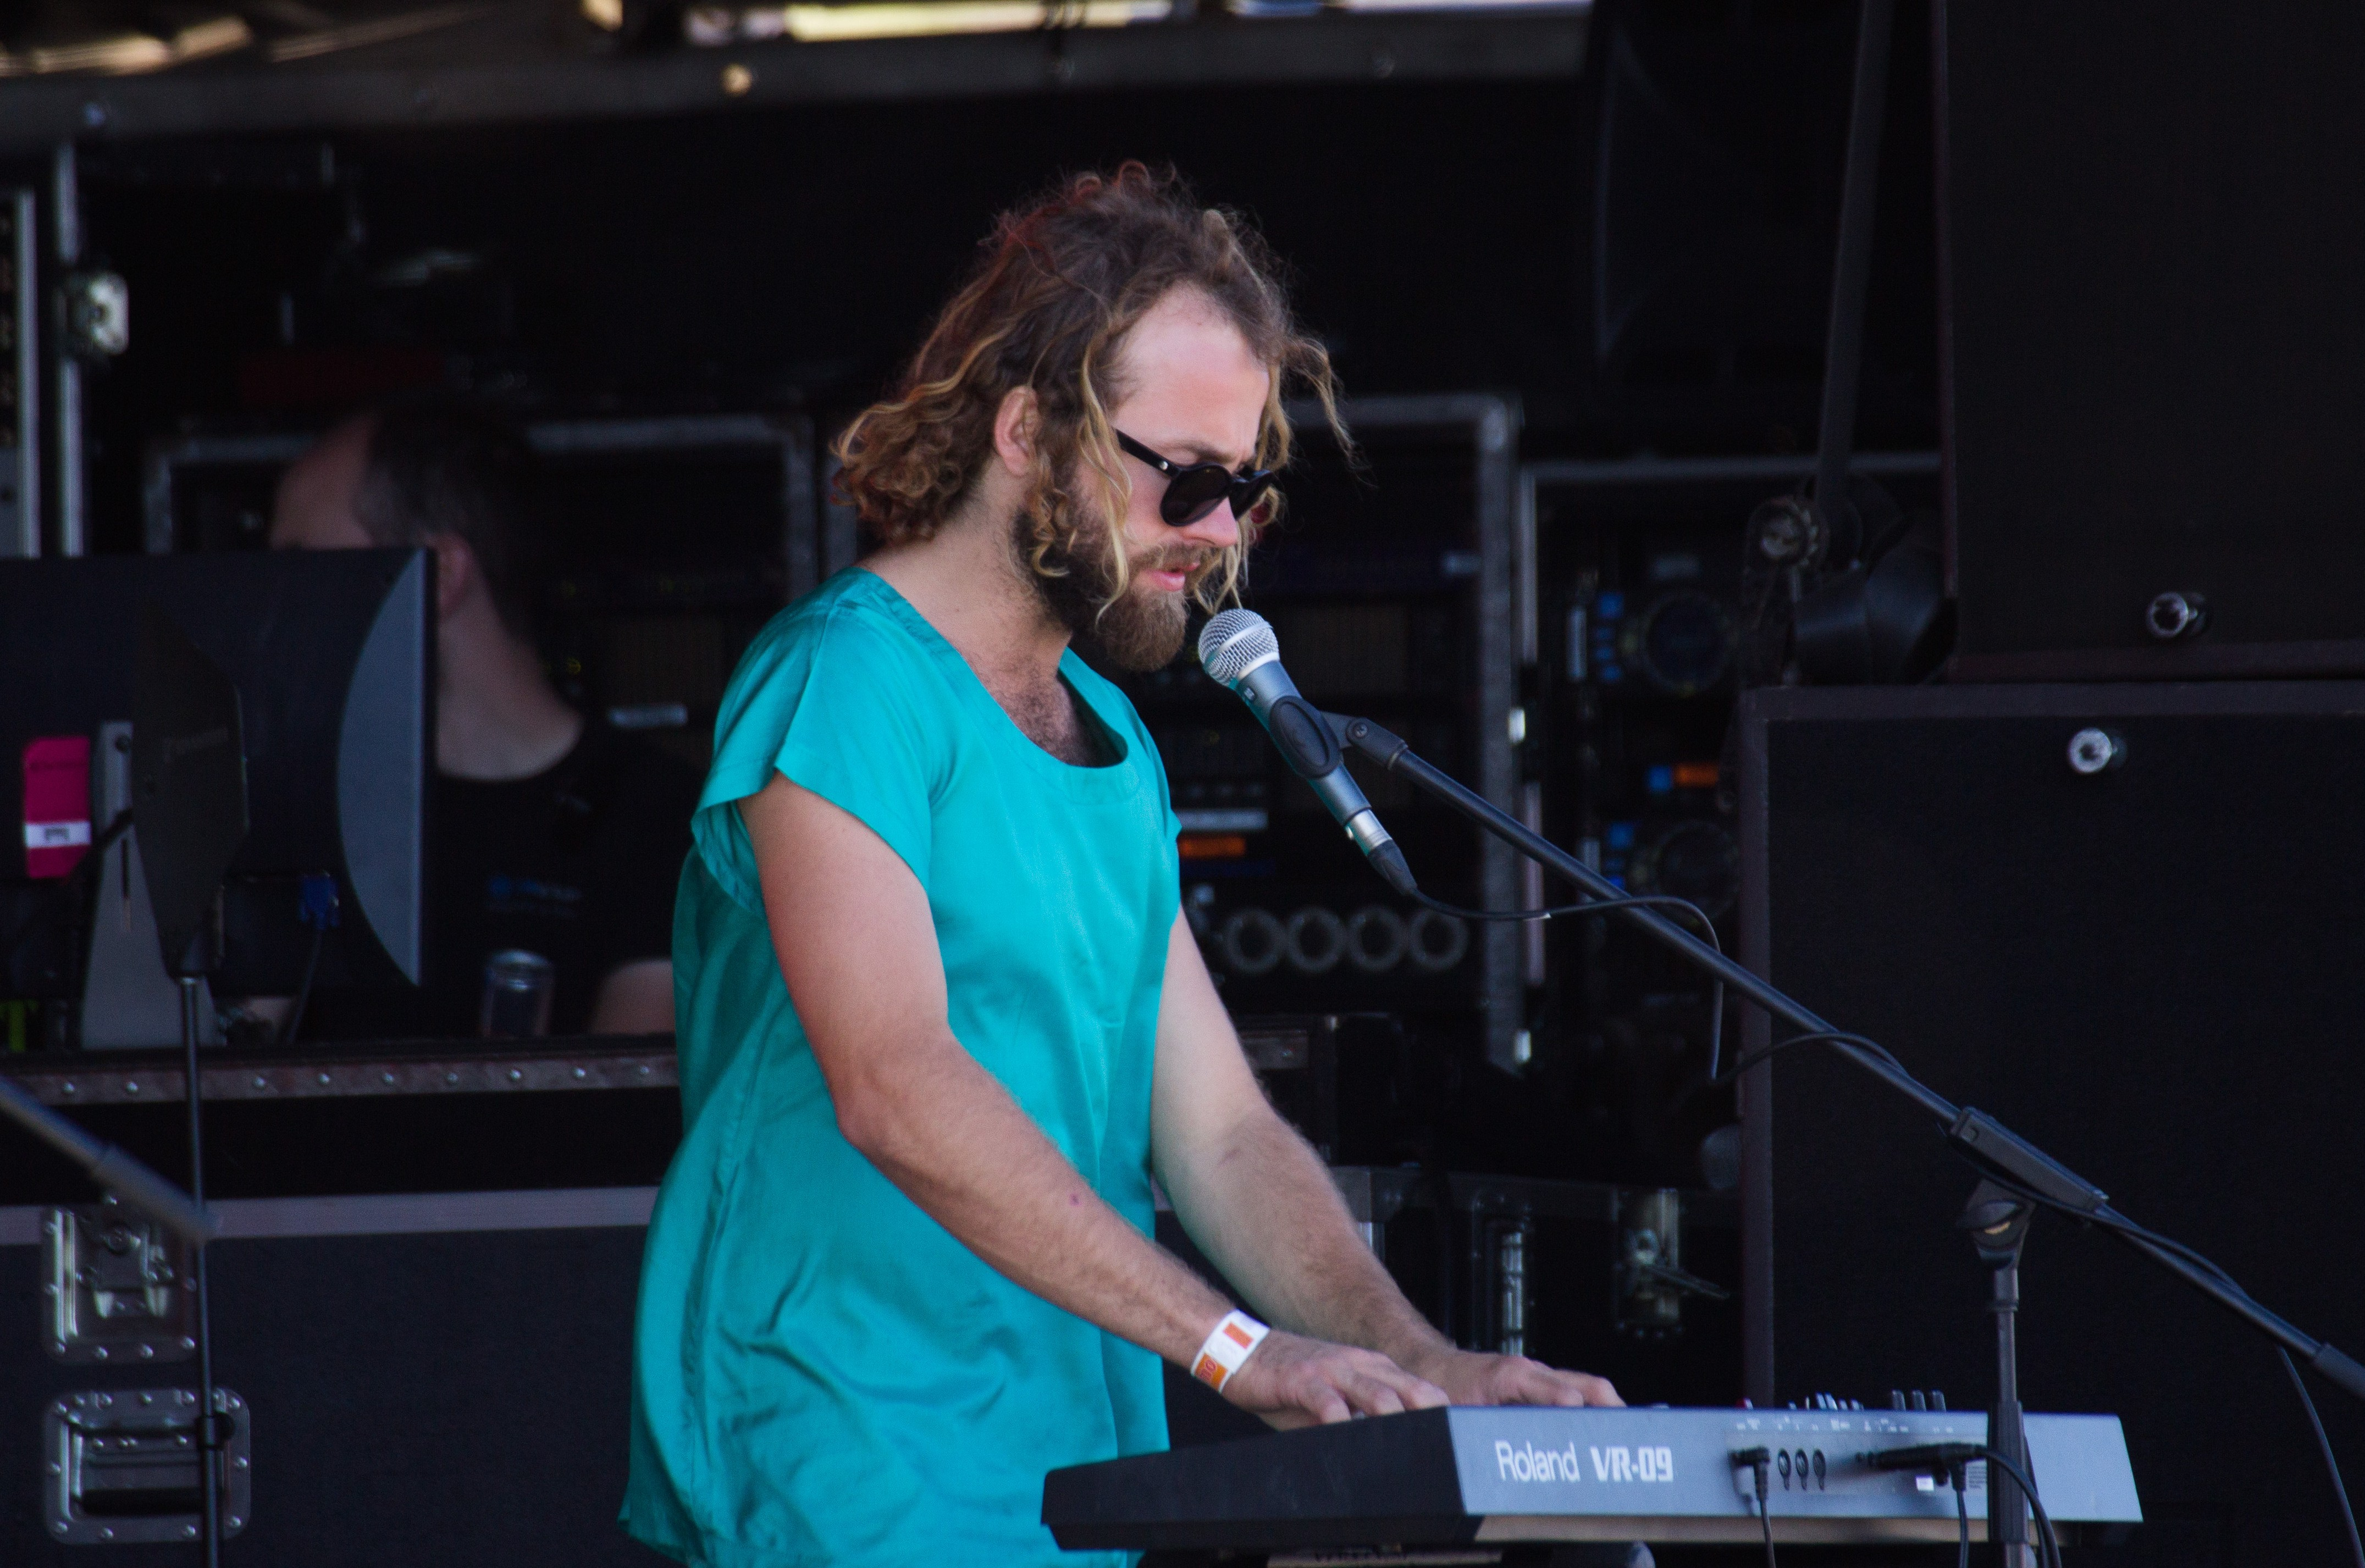 Ocean Alley perform at VANFEST 2016 on November 26, 2016 in Sydney, Australia